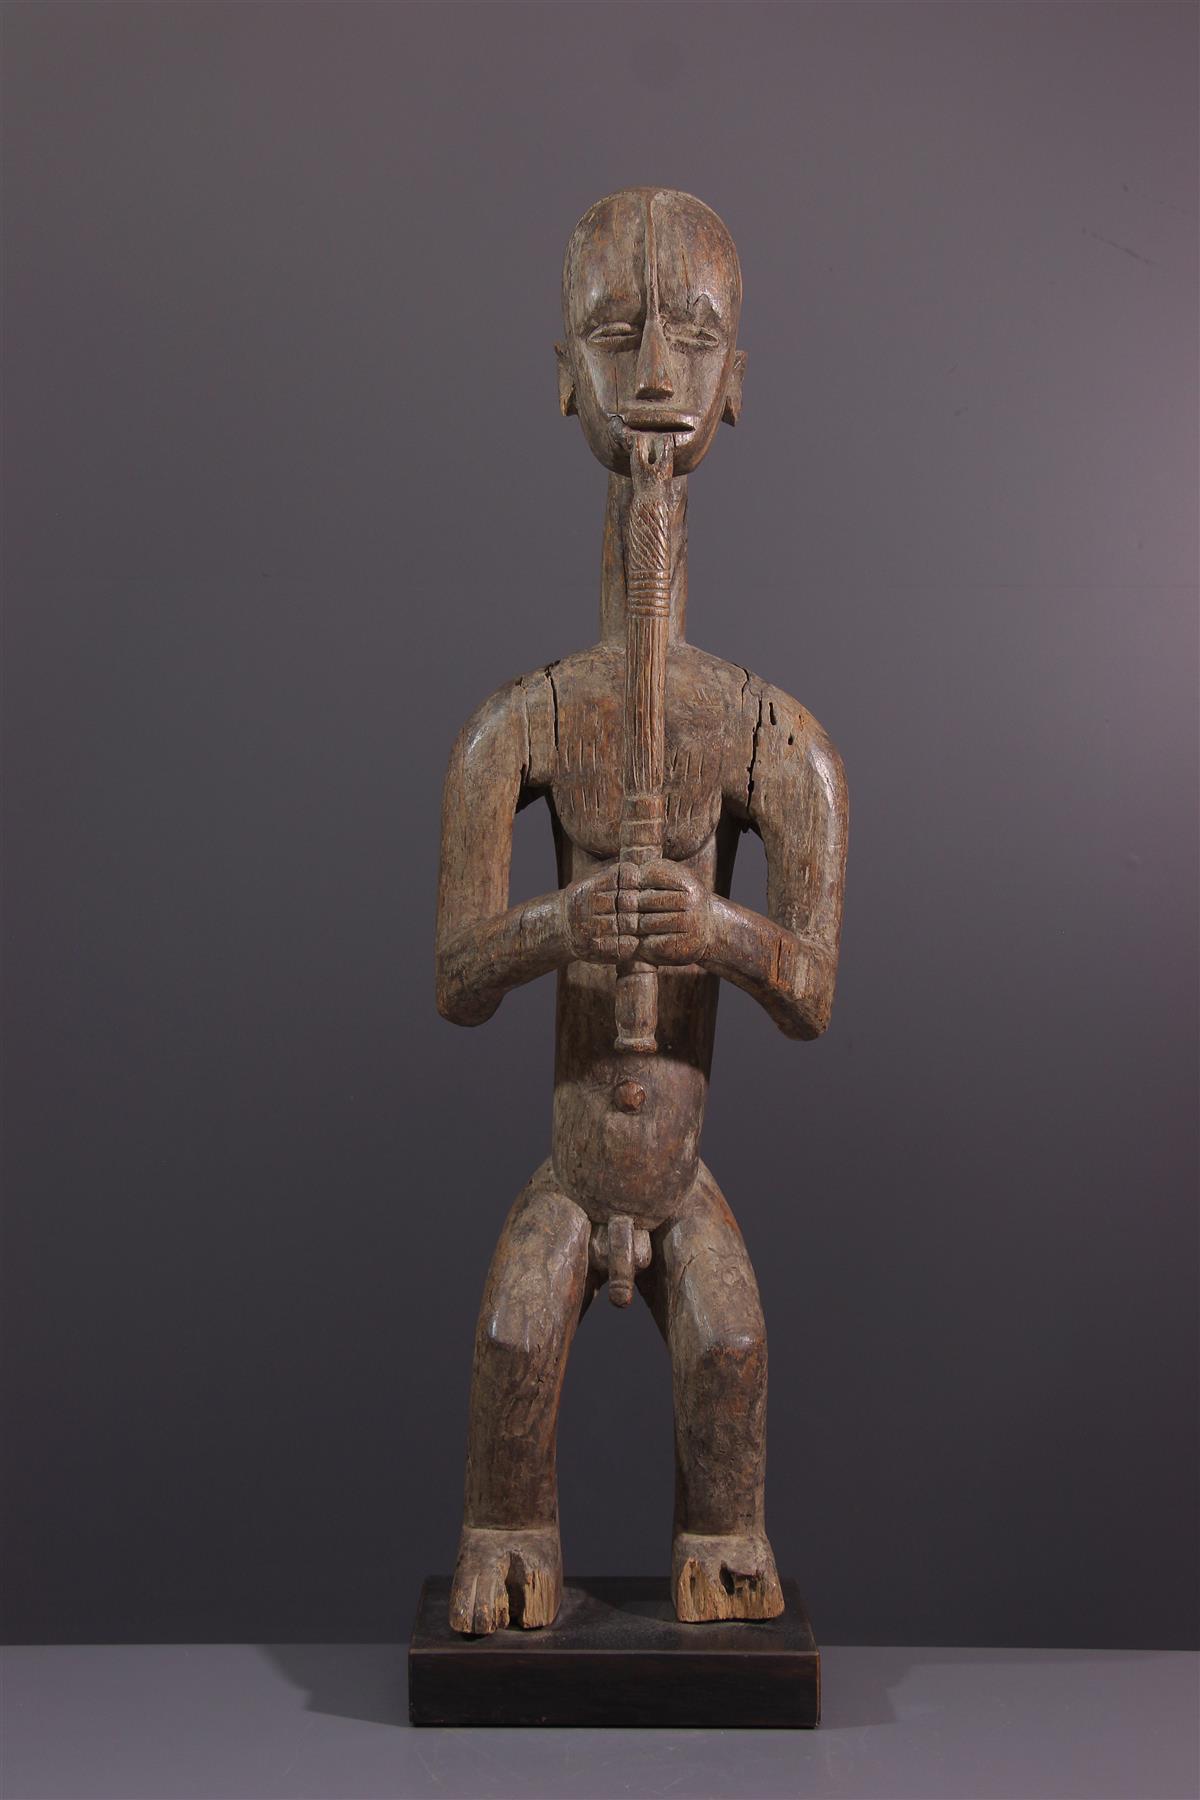 Idoma statue - Tribal art